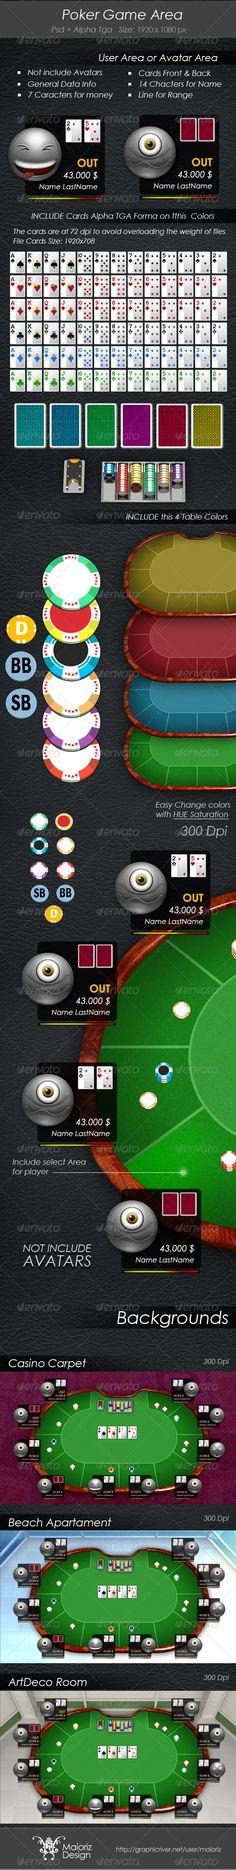 Facebook Poker    https://apps.facebook.com/cartel-poker #poker #facebook